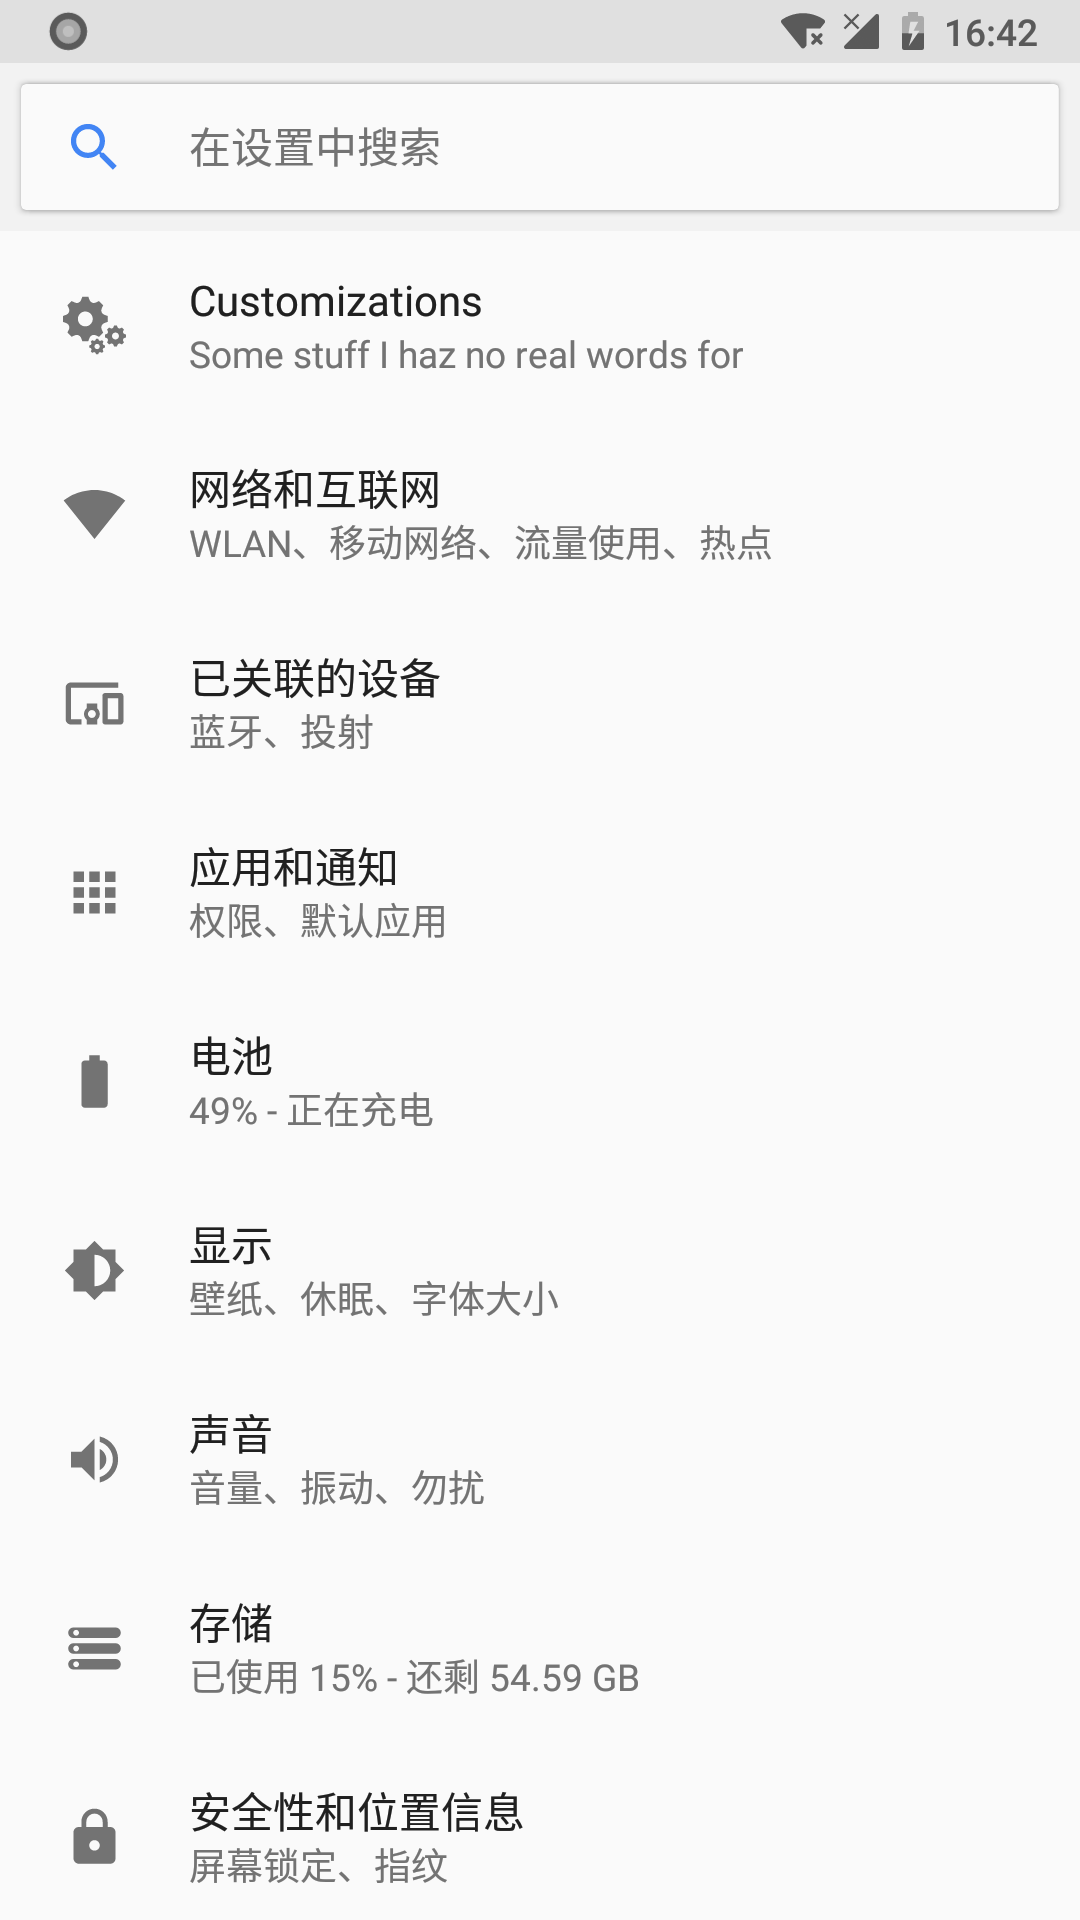 Screenshot_20171206-164213.png